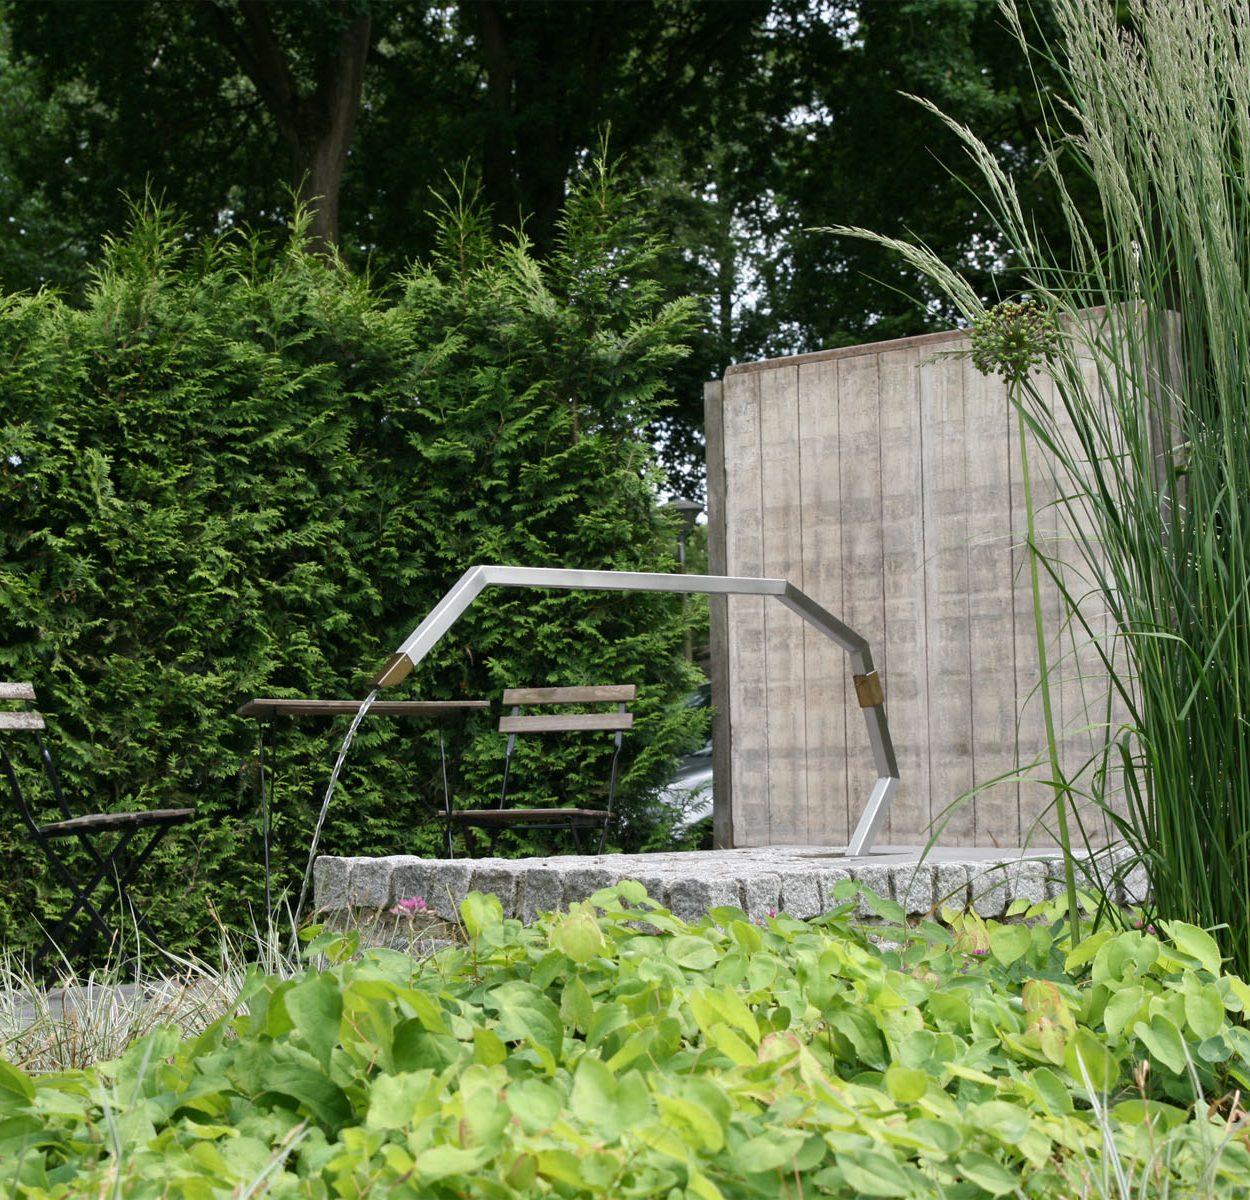 Waterornament en brug - cirkel van RVS, messing en water